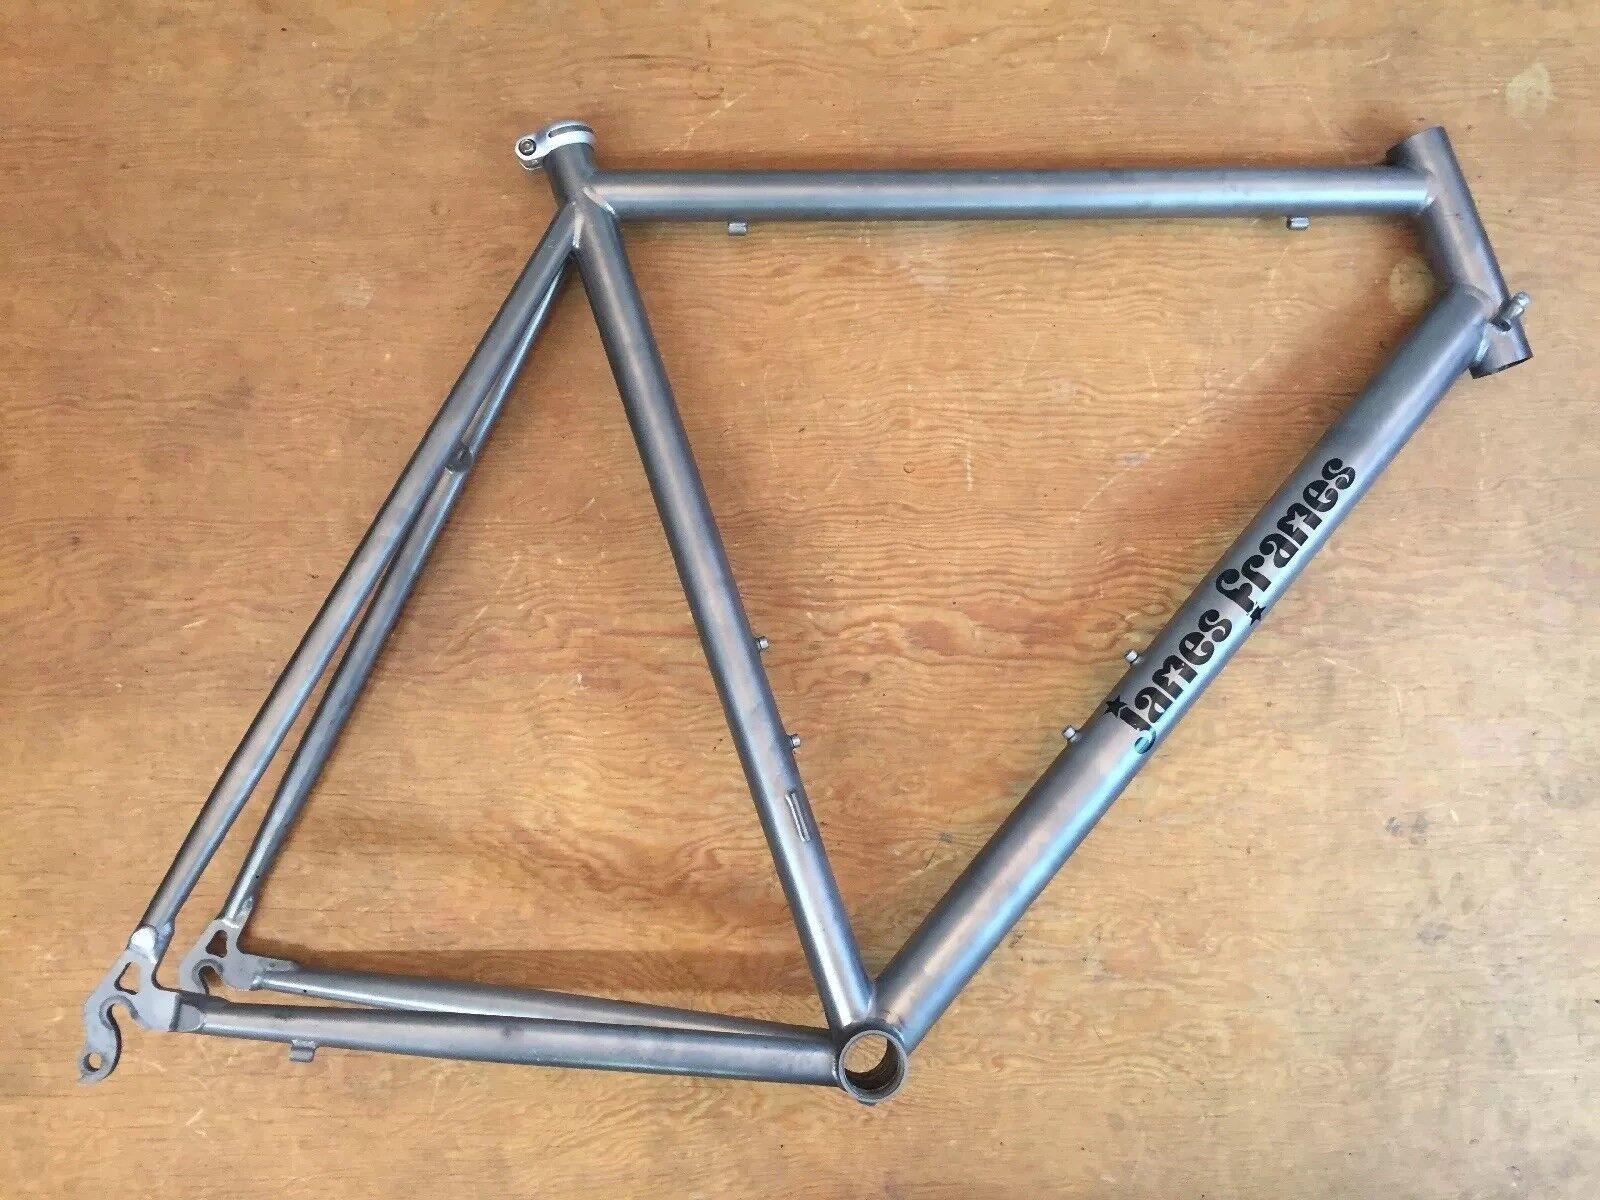 James Frames Ti Titanium Road Bike Frame 56cm